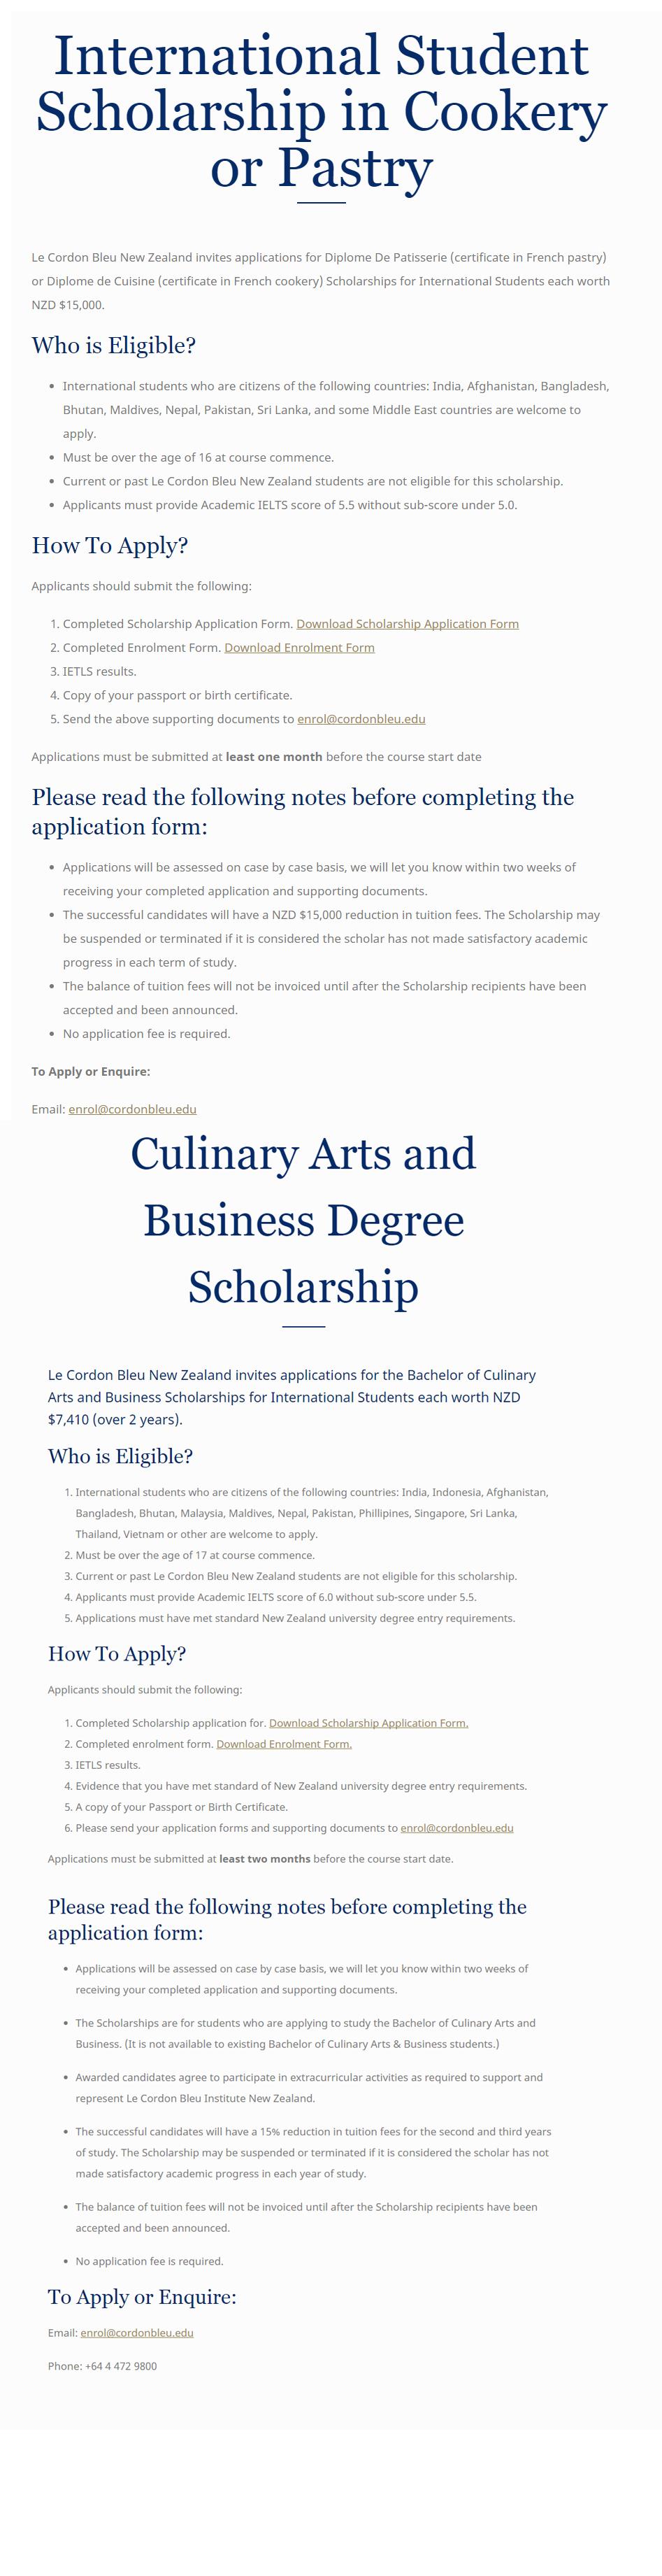 https://ishallwin.com/Content/ScholarshipImages/636384056293303565-Banner.jpg